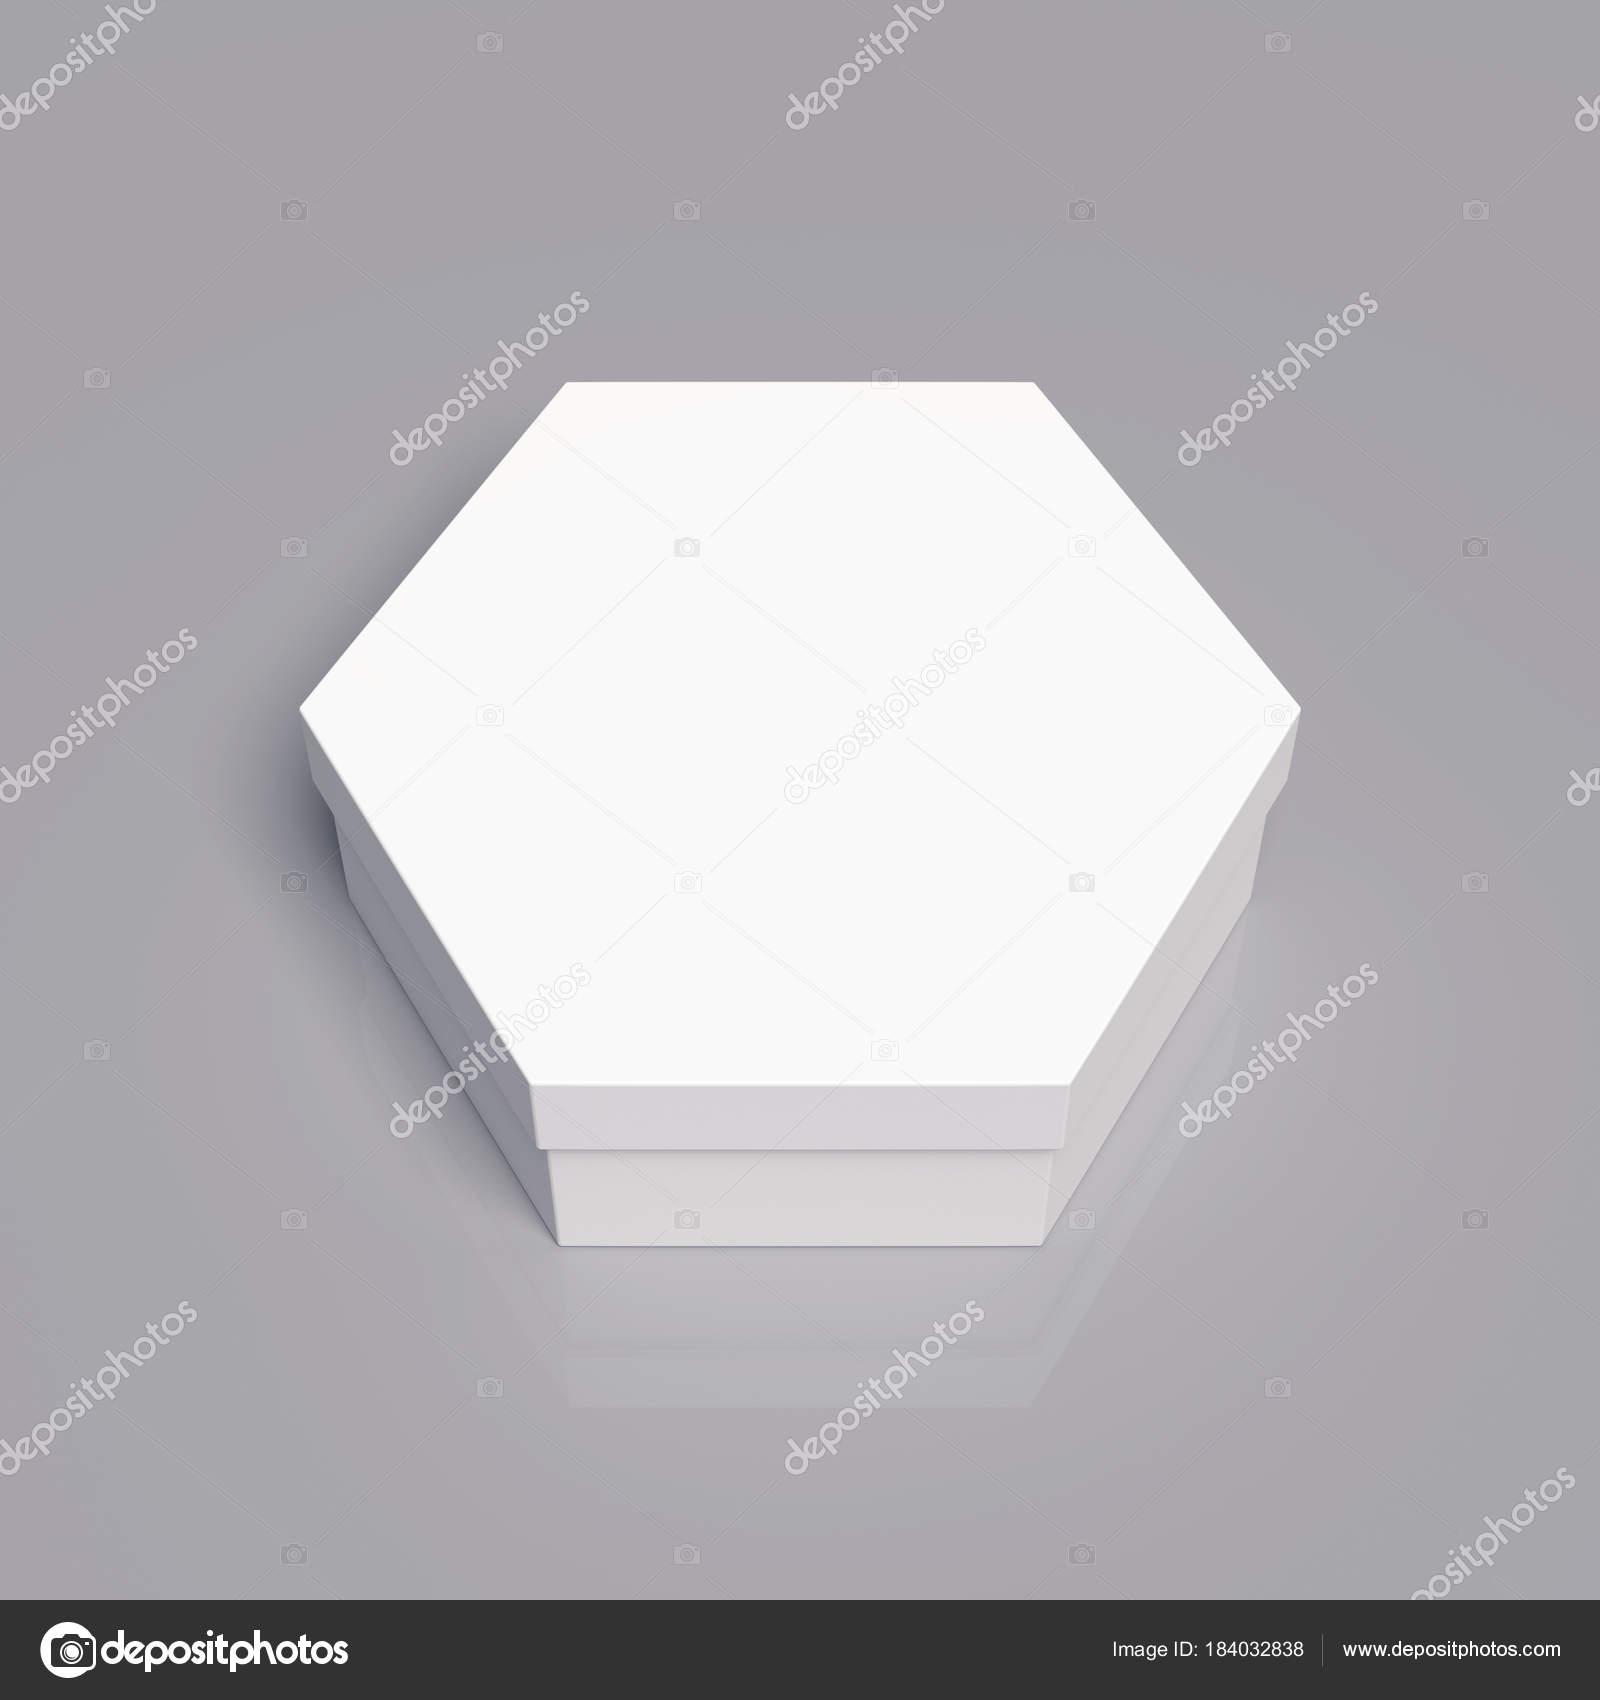 plantilla de caja de cartón — Foto de stock © TissaNsk #184032838